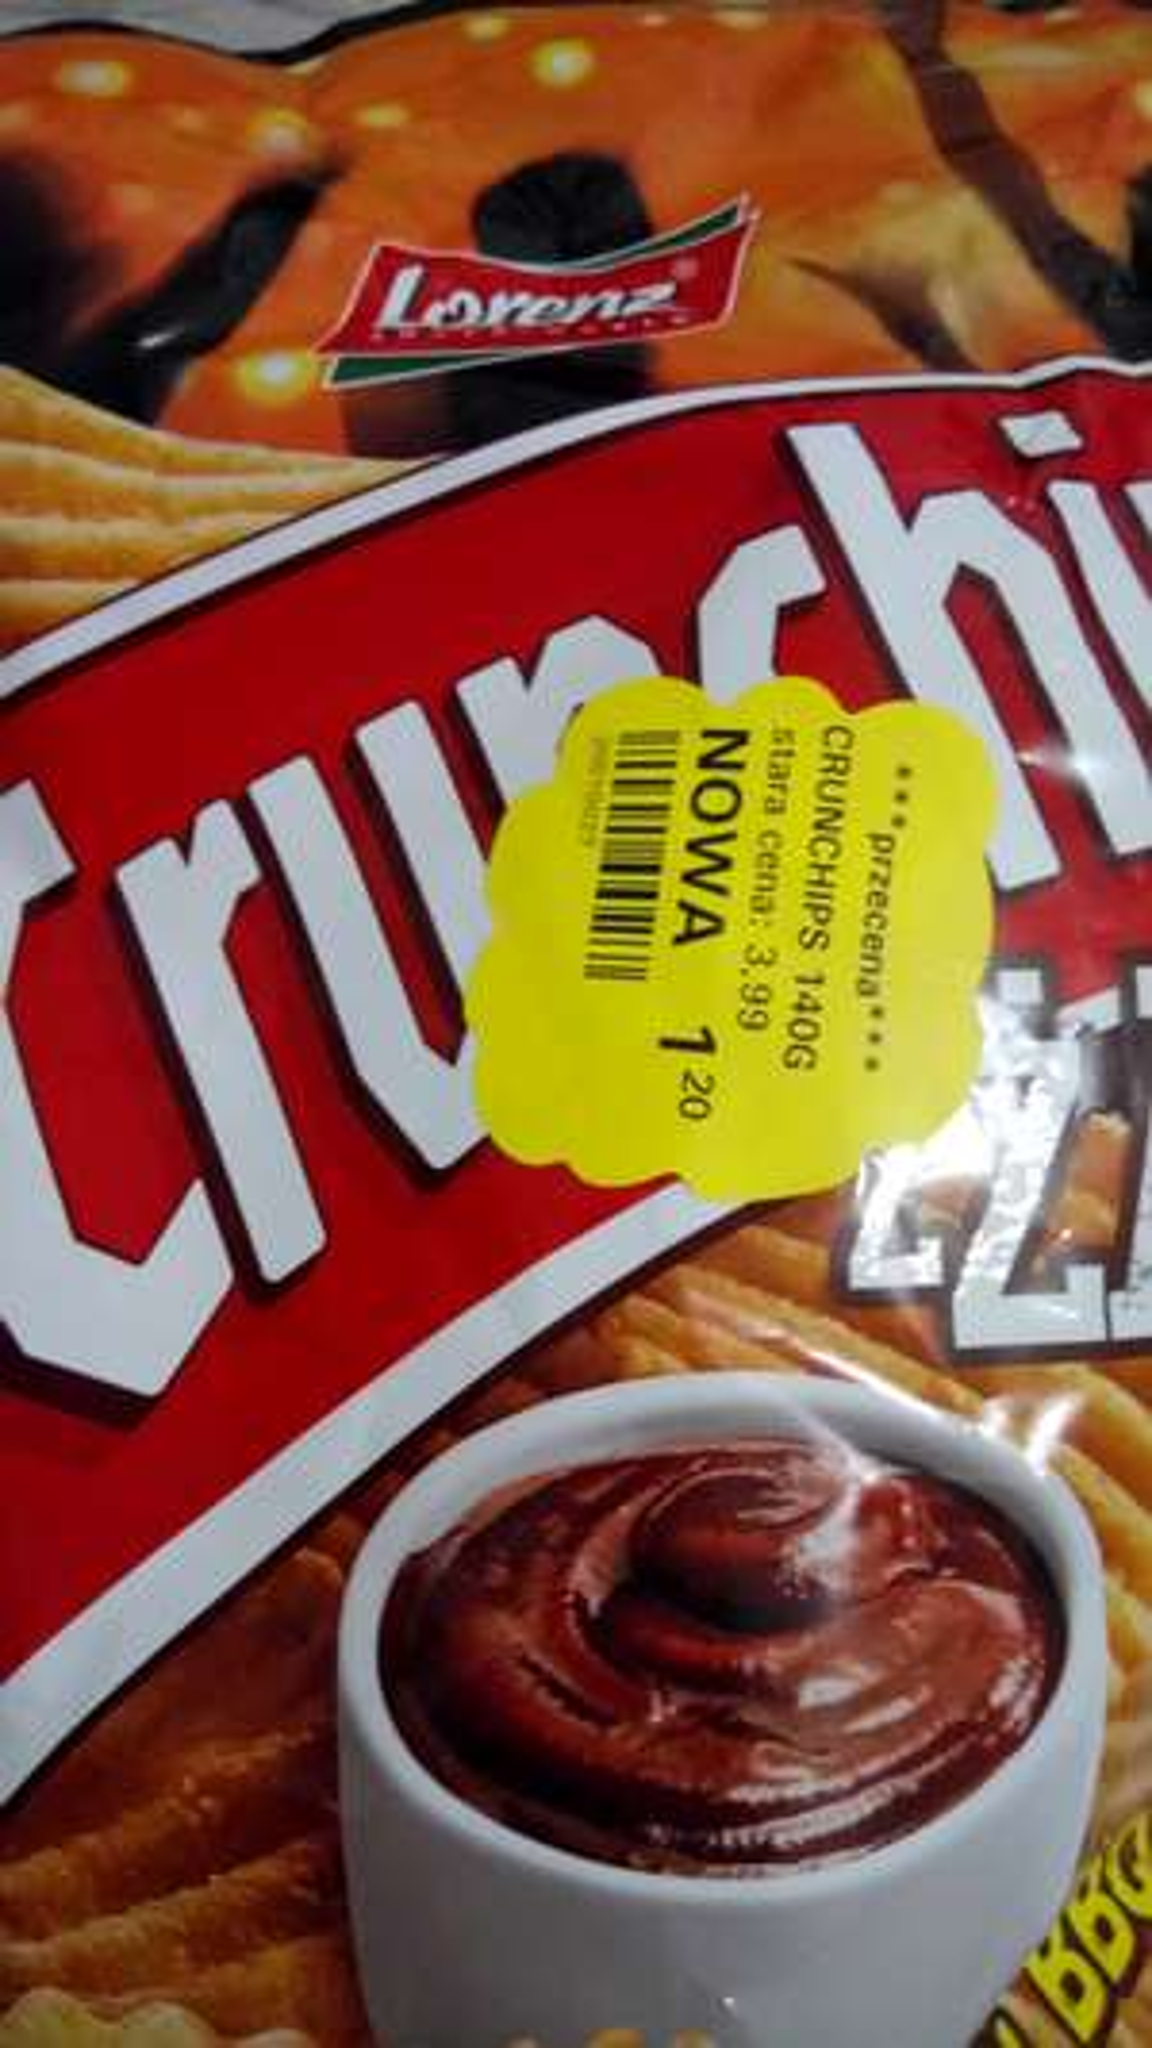 Crunchips za 1.20 zł